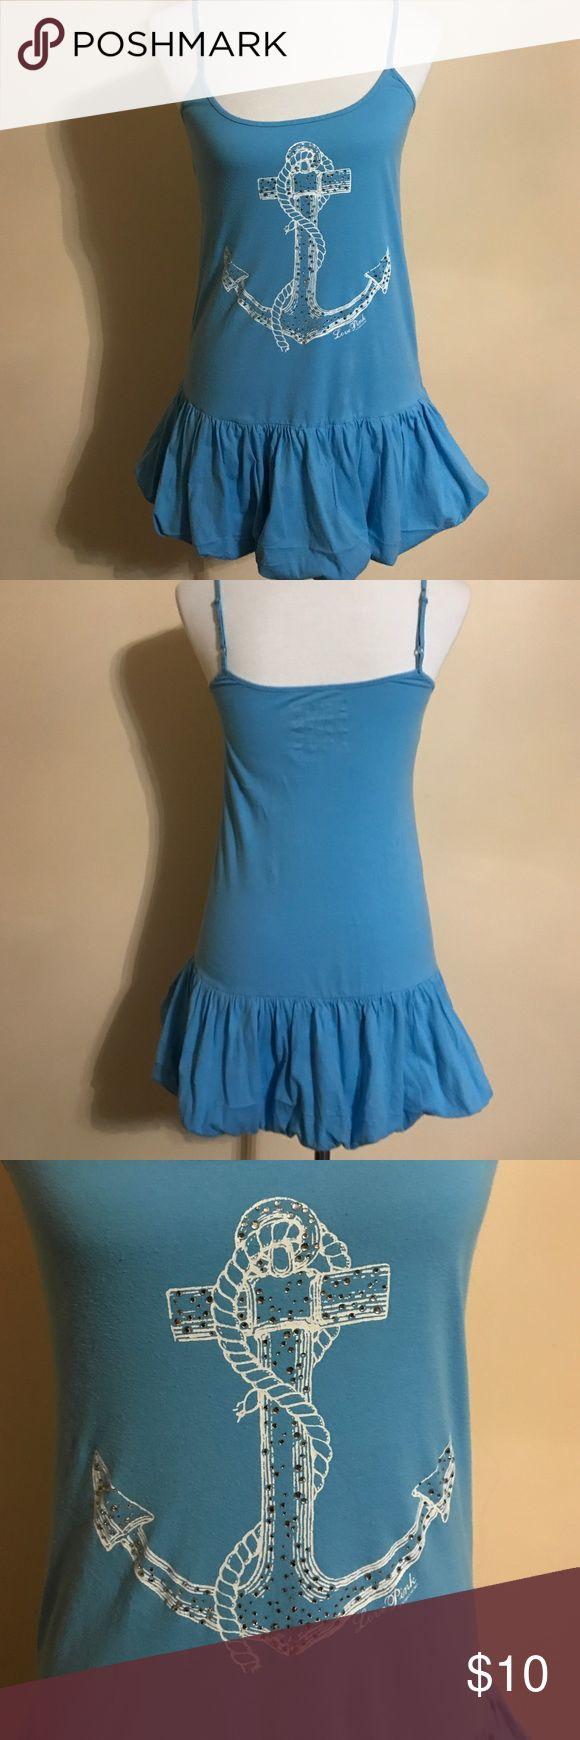 Victoria Secret Beach Dress True Pink Love dress. Size XS. Blue color. Used but still ok. PINK Victoria's Secret Dresses